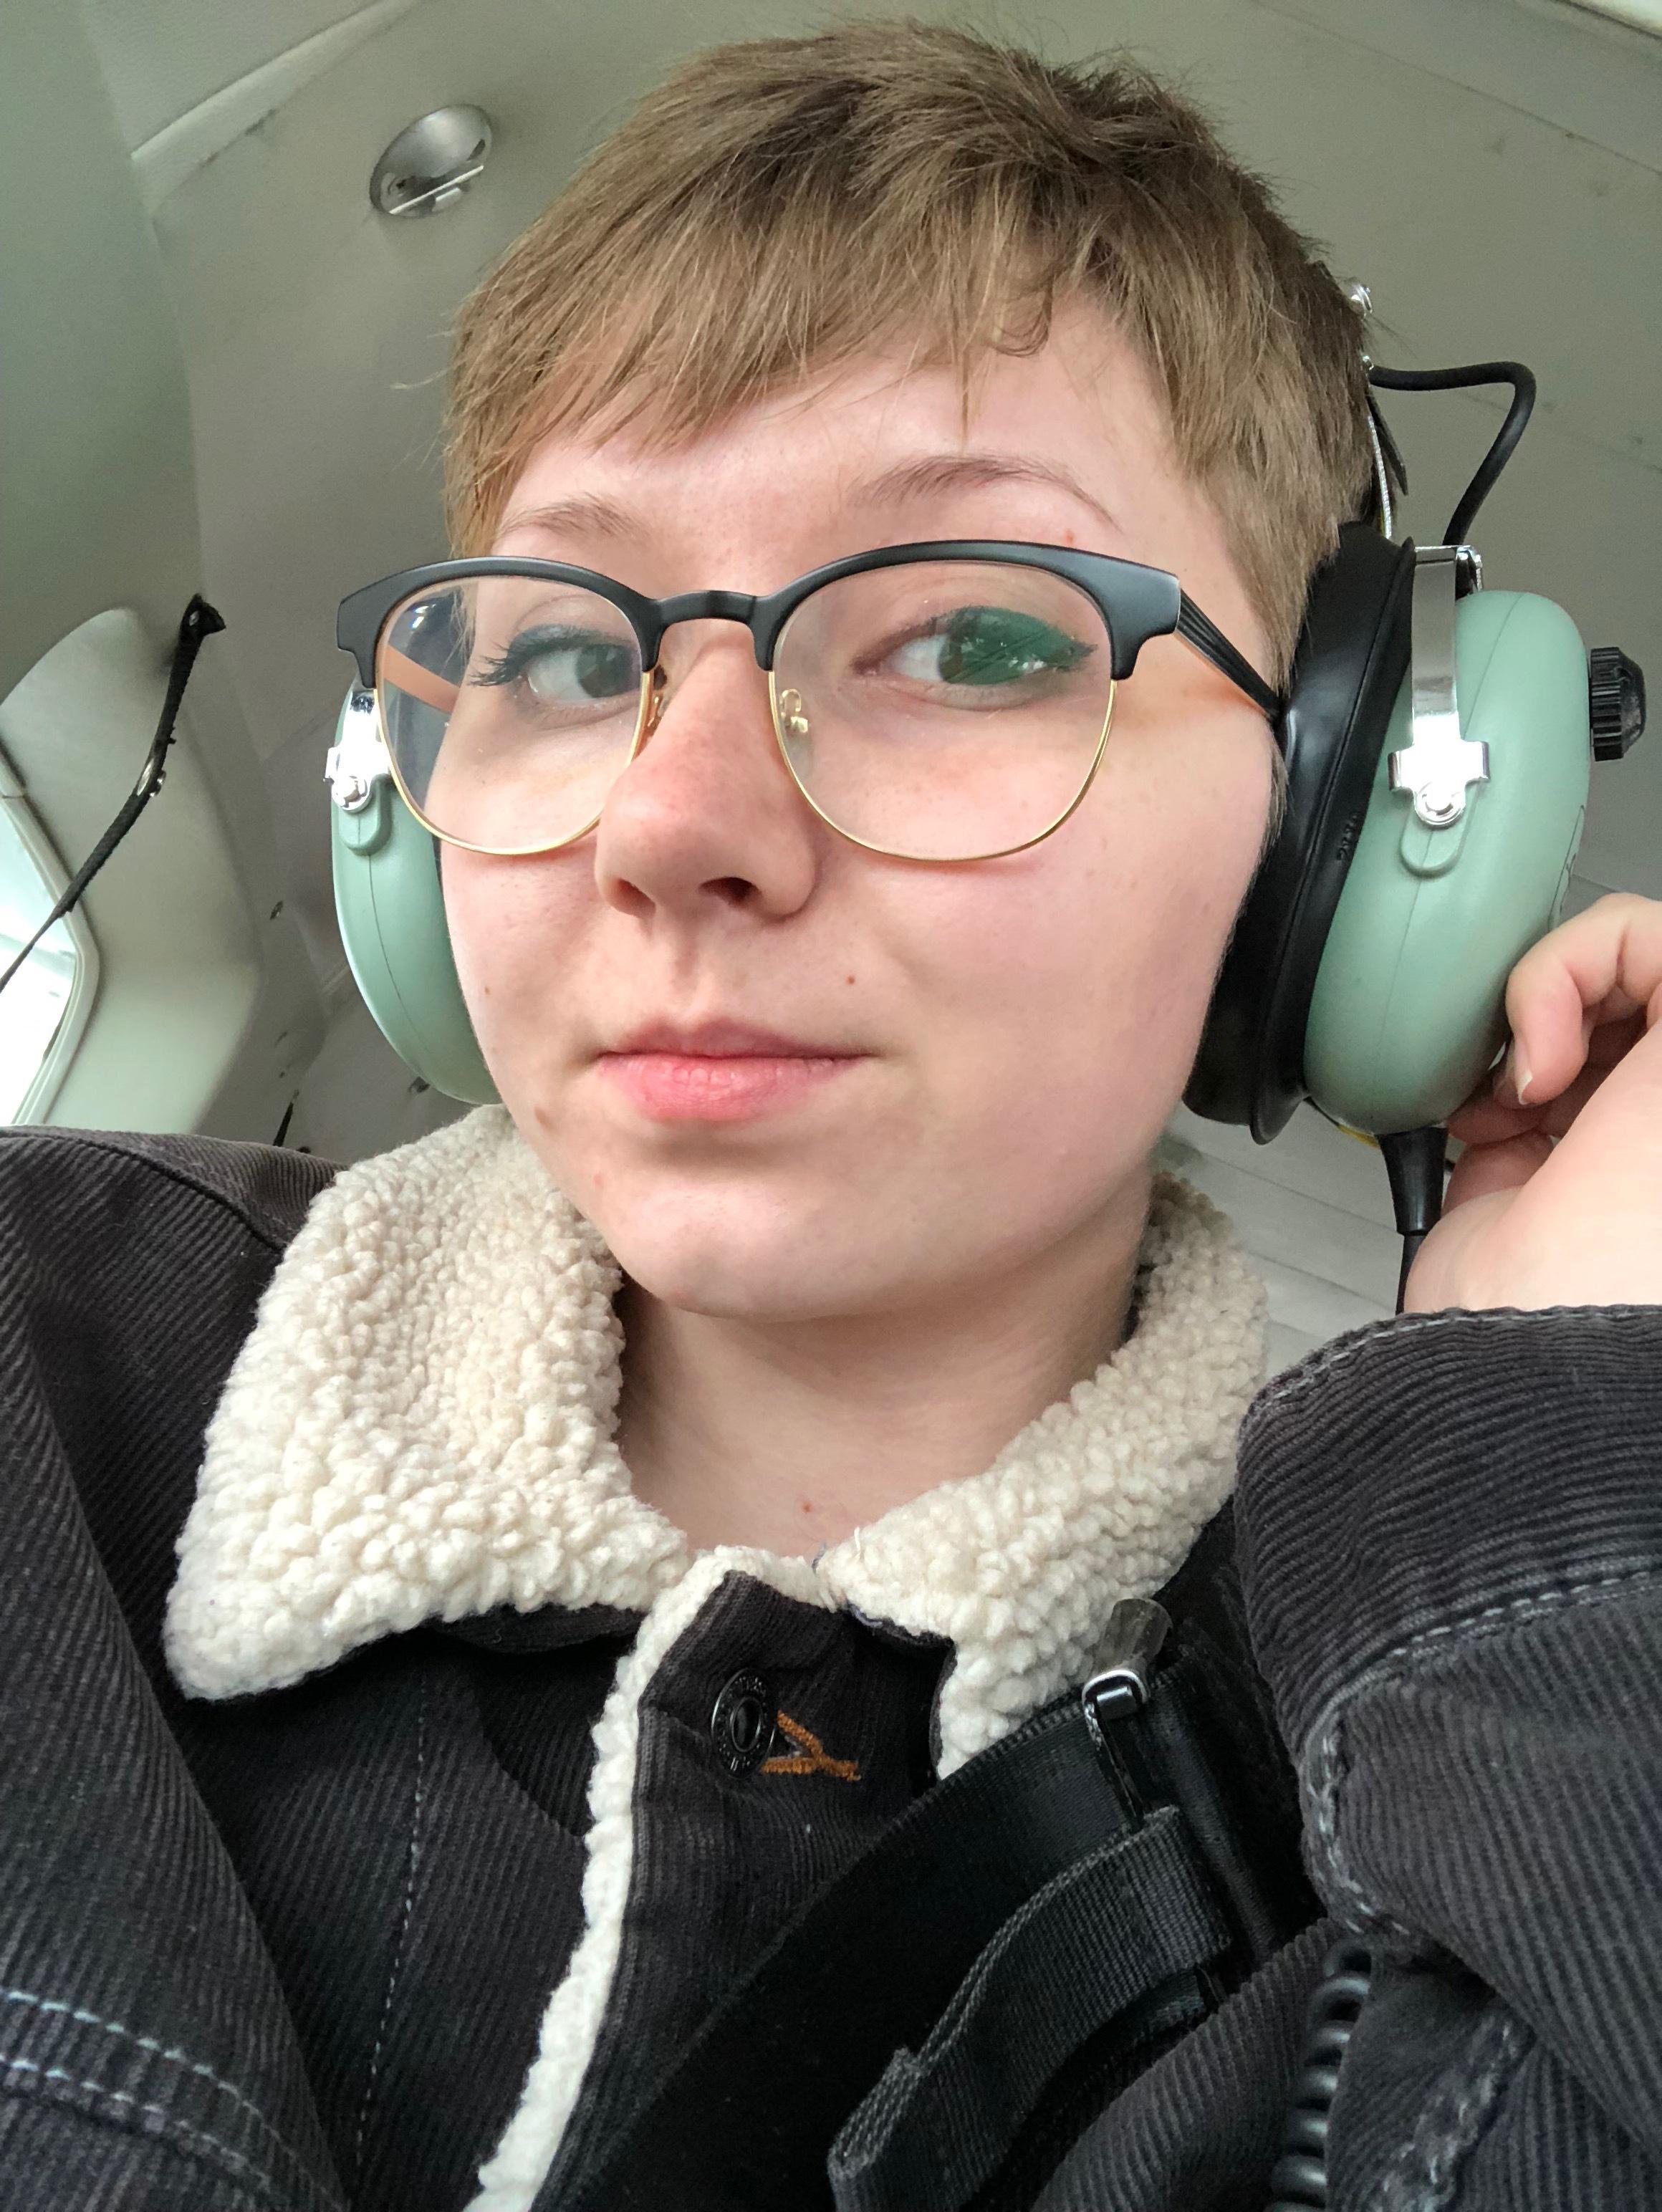 On an Island Air Flight